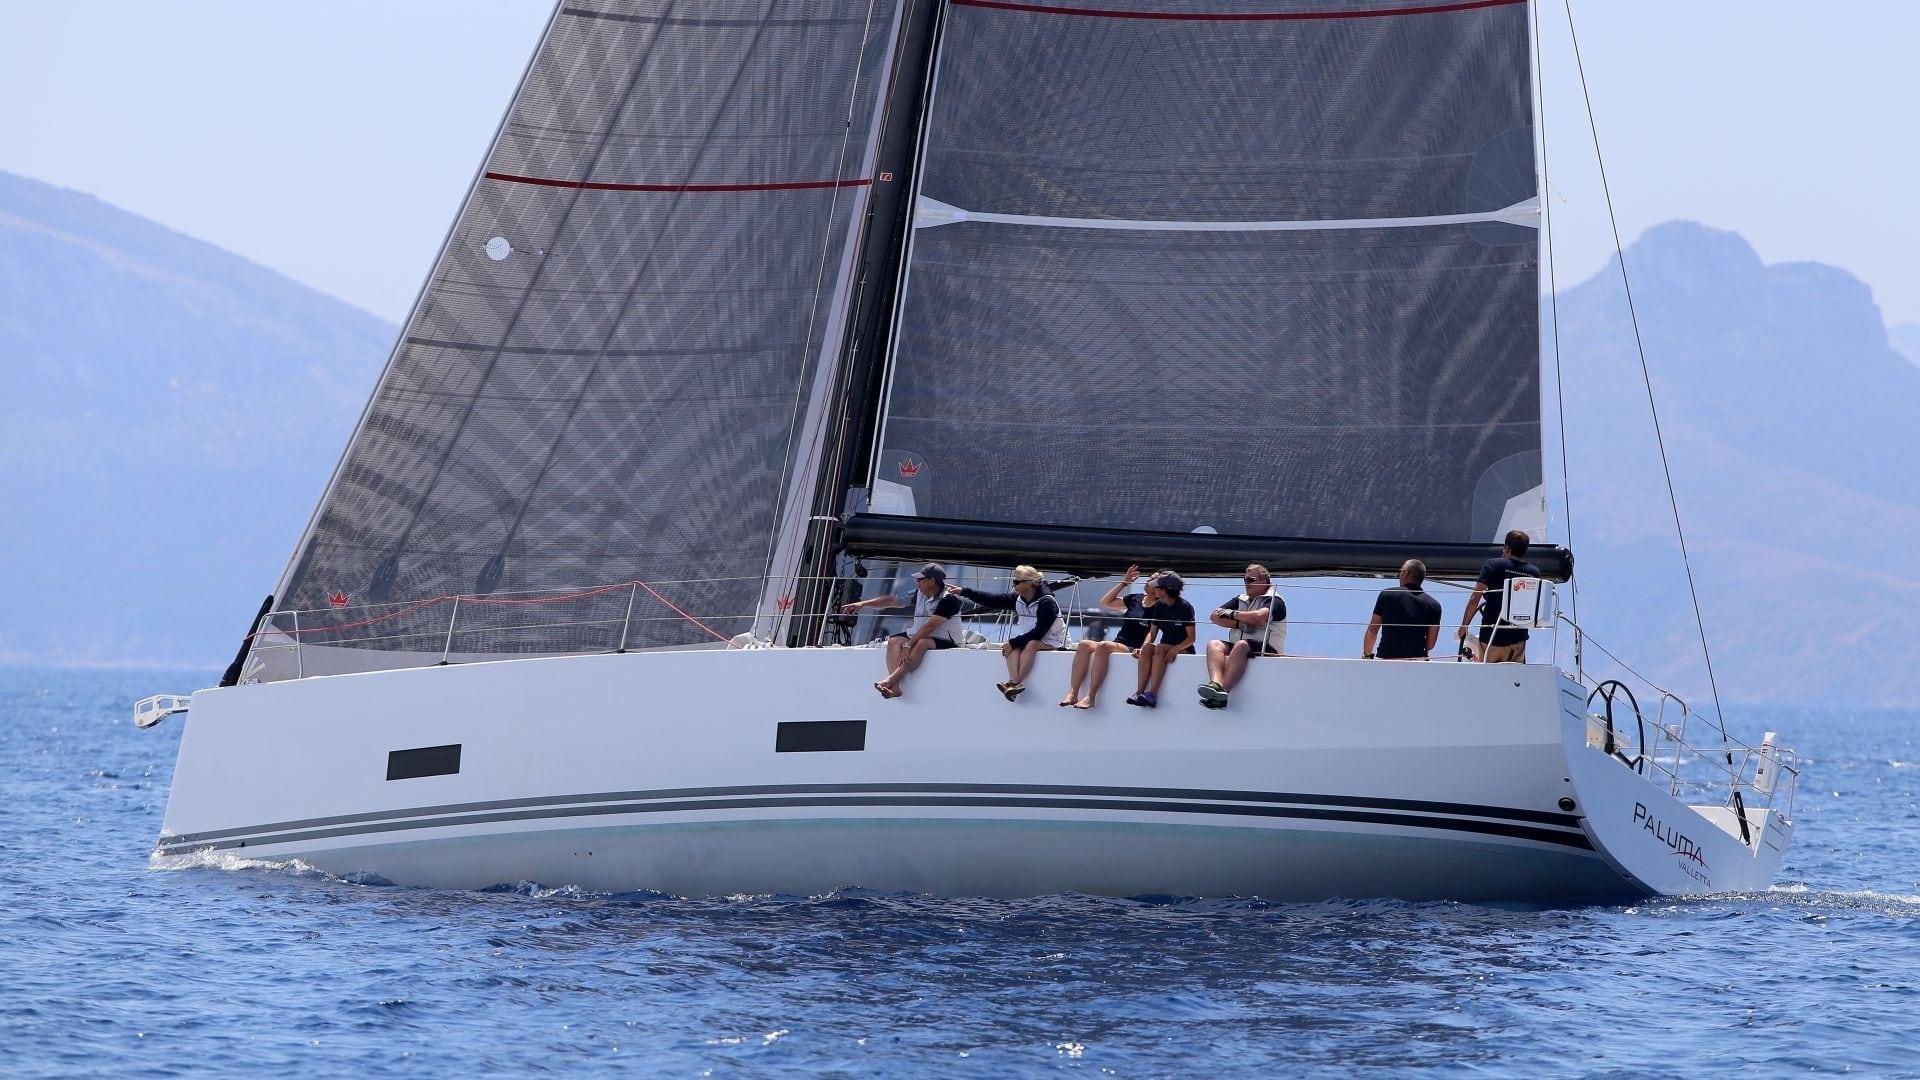 Solaris 47 Fastsailing Greece Charter